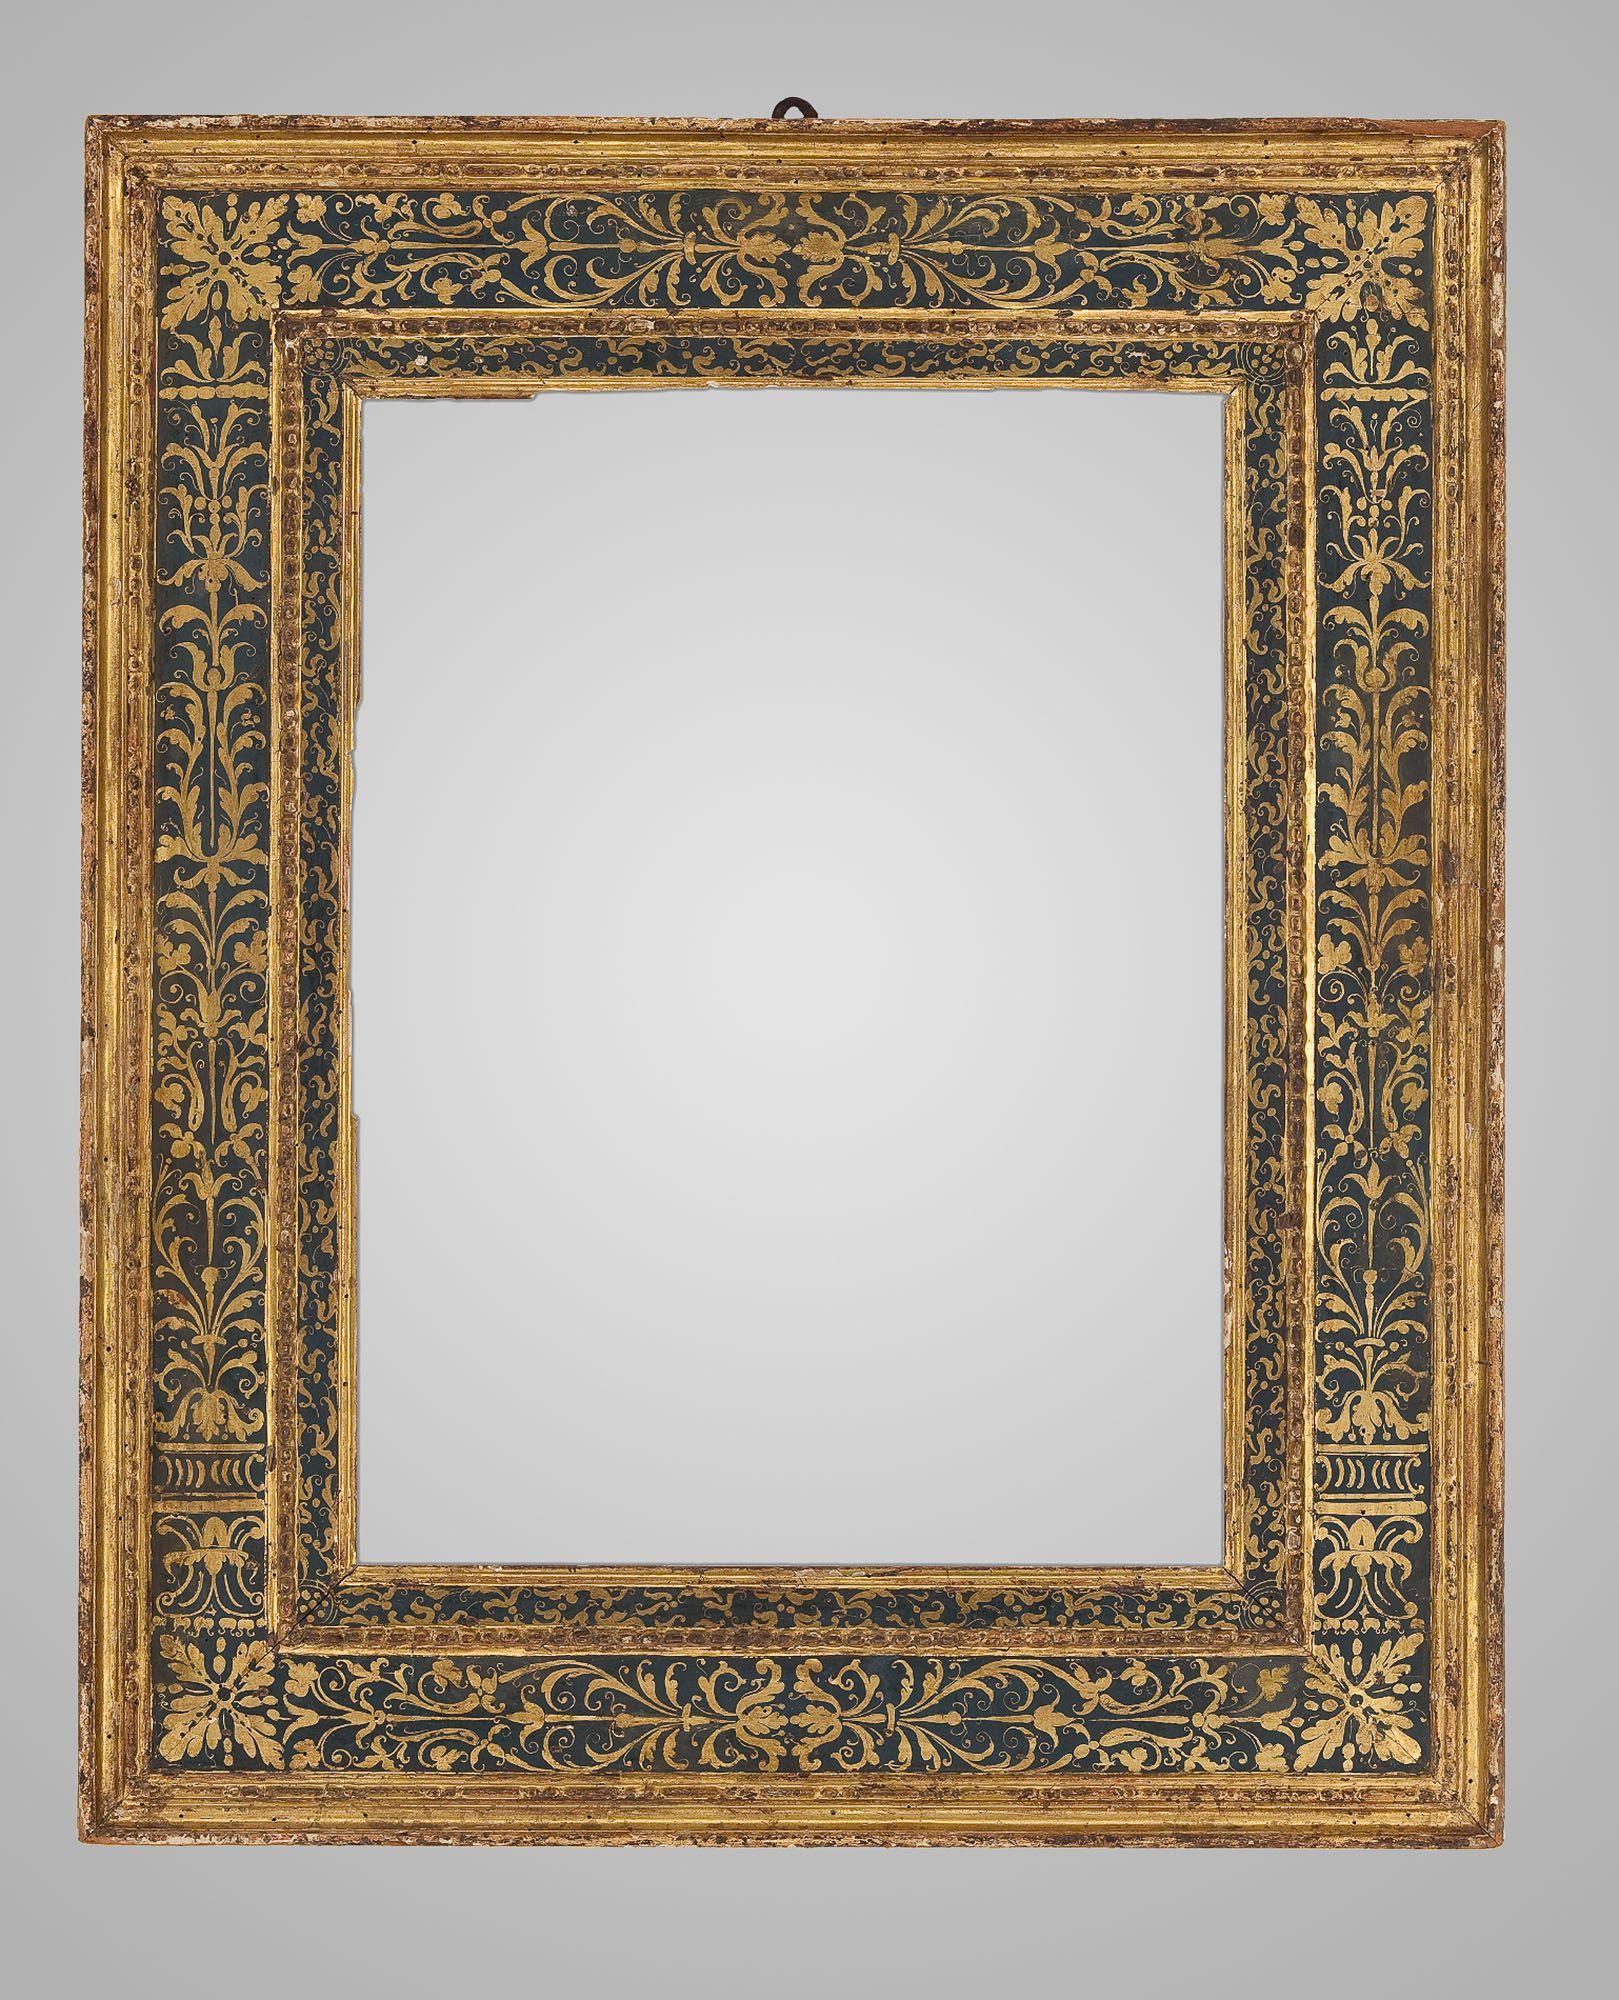 Italian Renaissance Style Cassetta Frame (1700 - 1800) | Frames ...